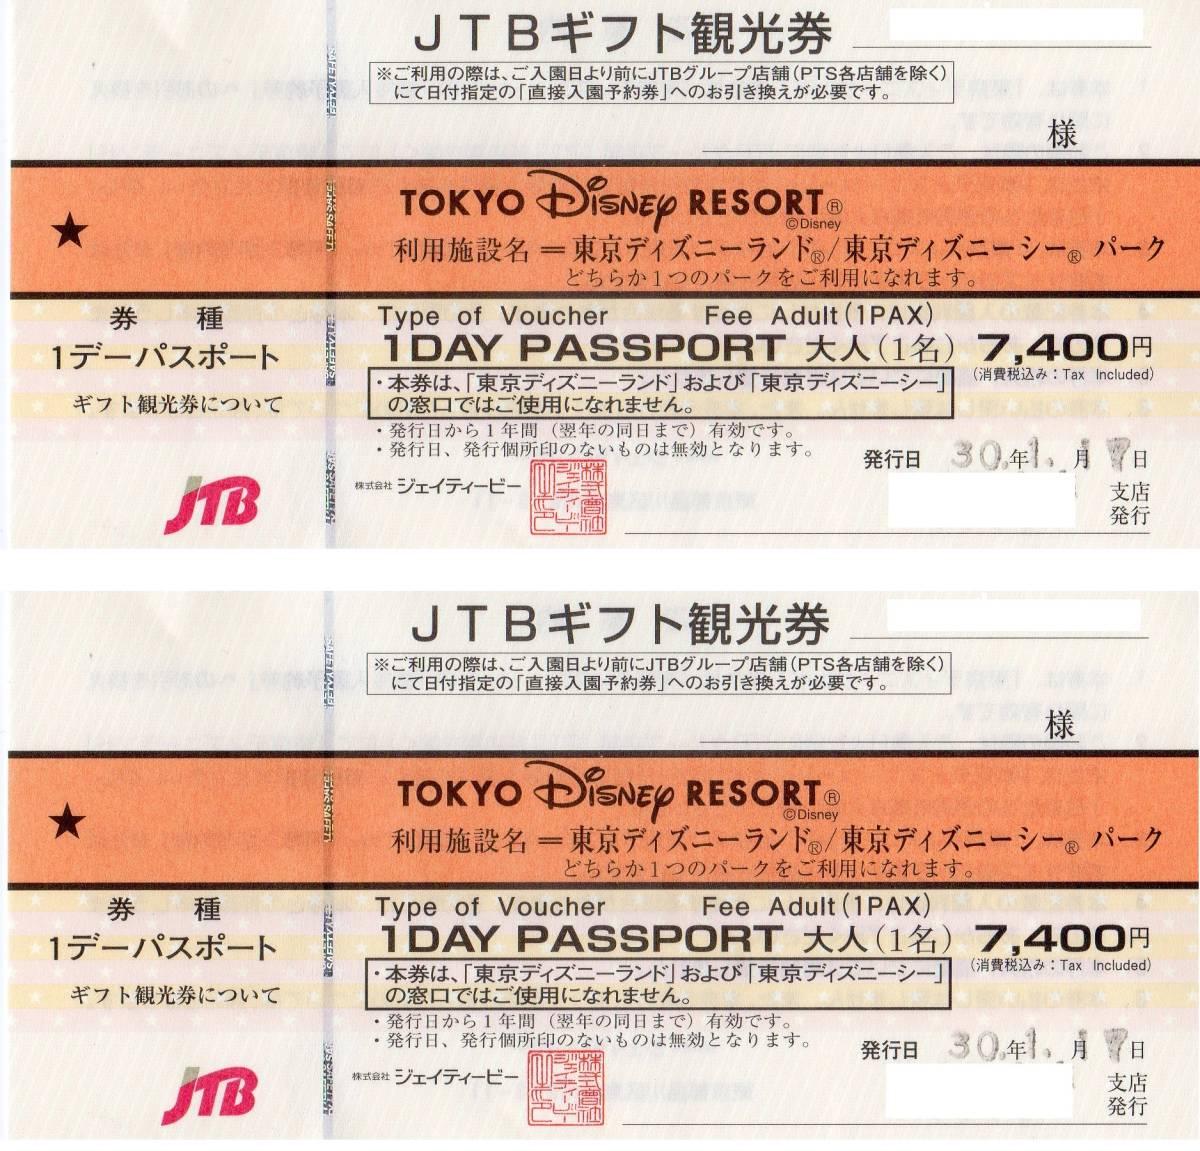 jtb ディズニーの値段と価格推移は?|34件の売買情報を集計したjtb